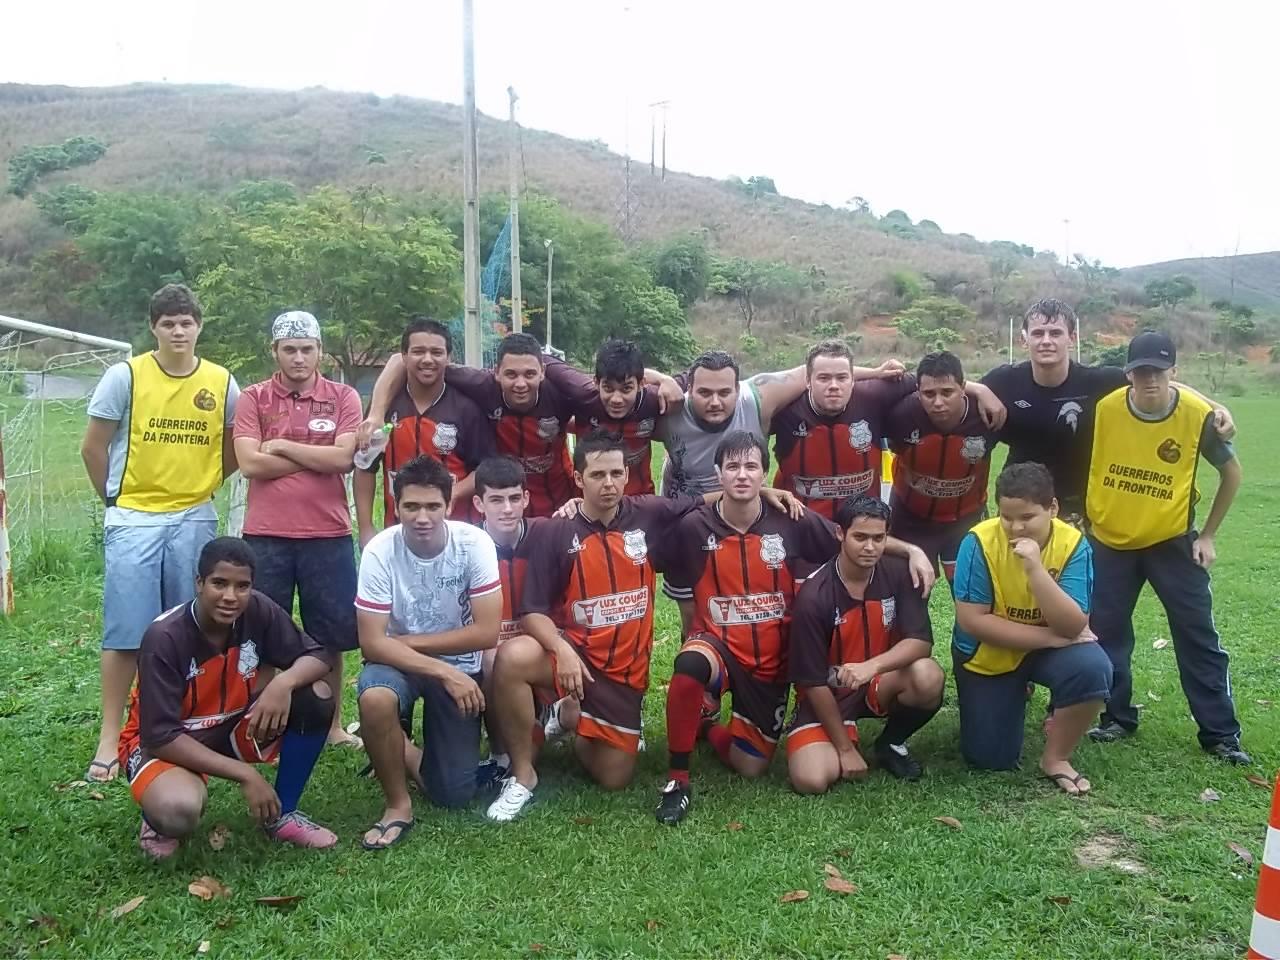 Baixo Guandu host competitive matches against Caxias do Sul